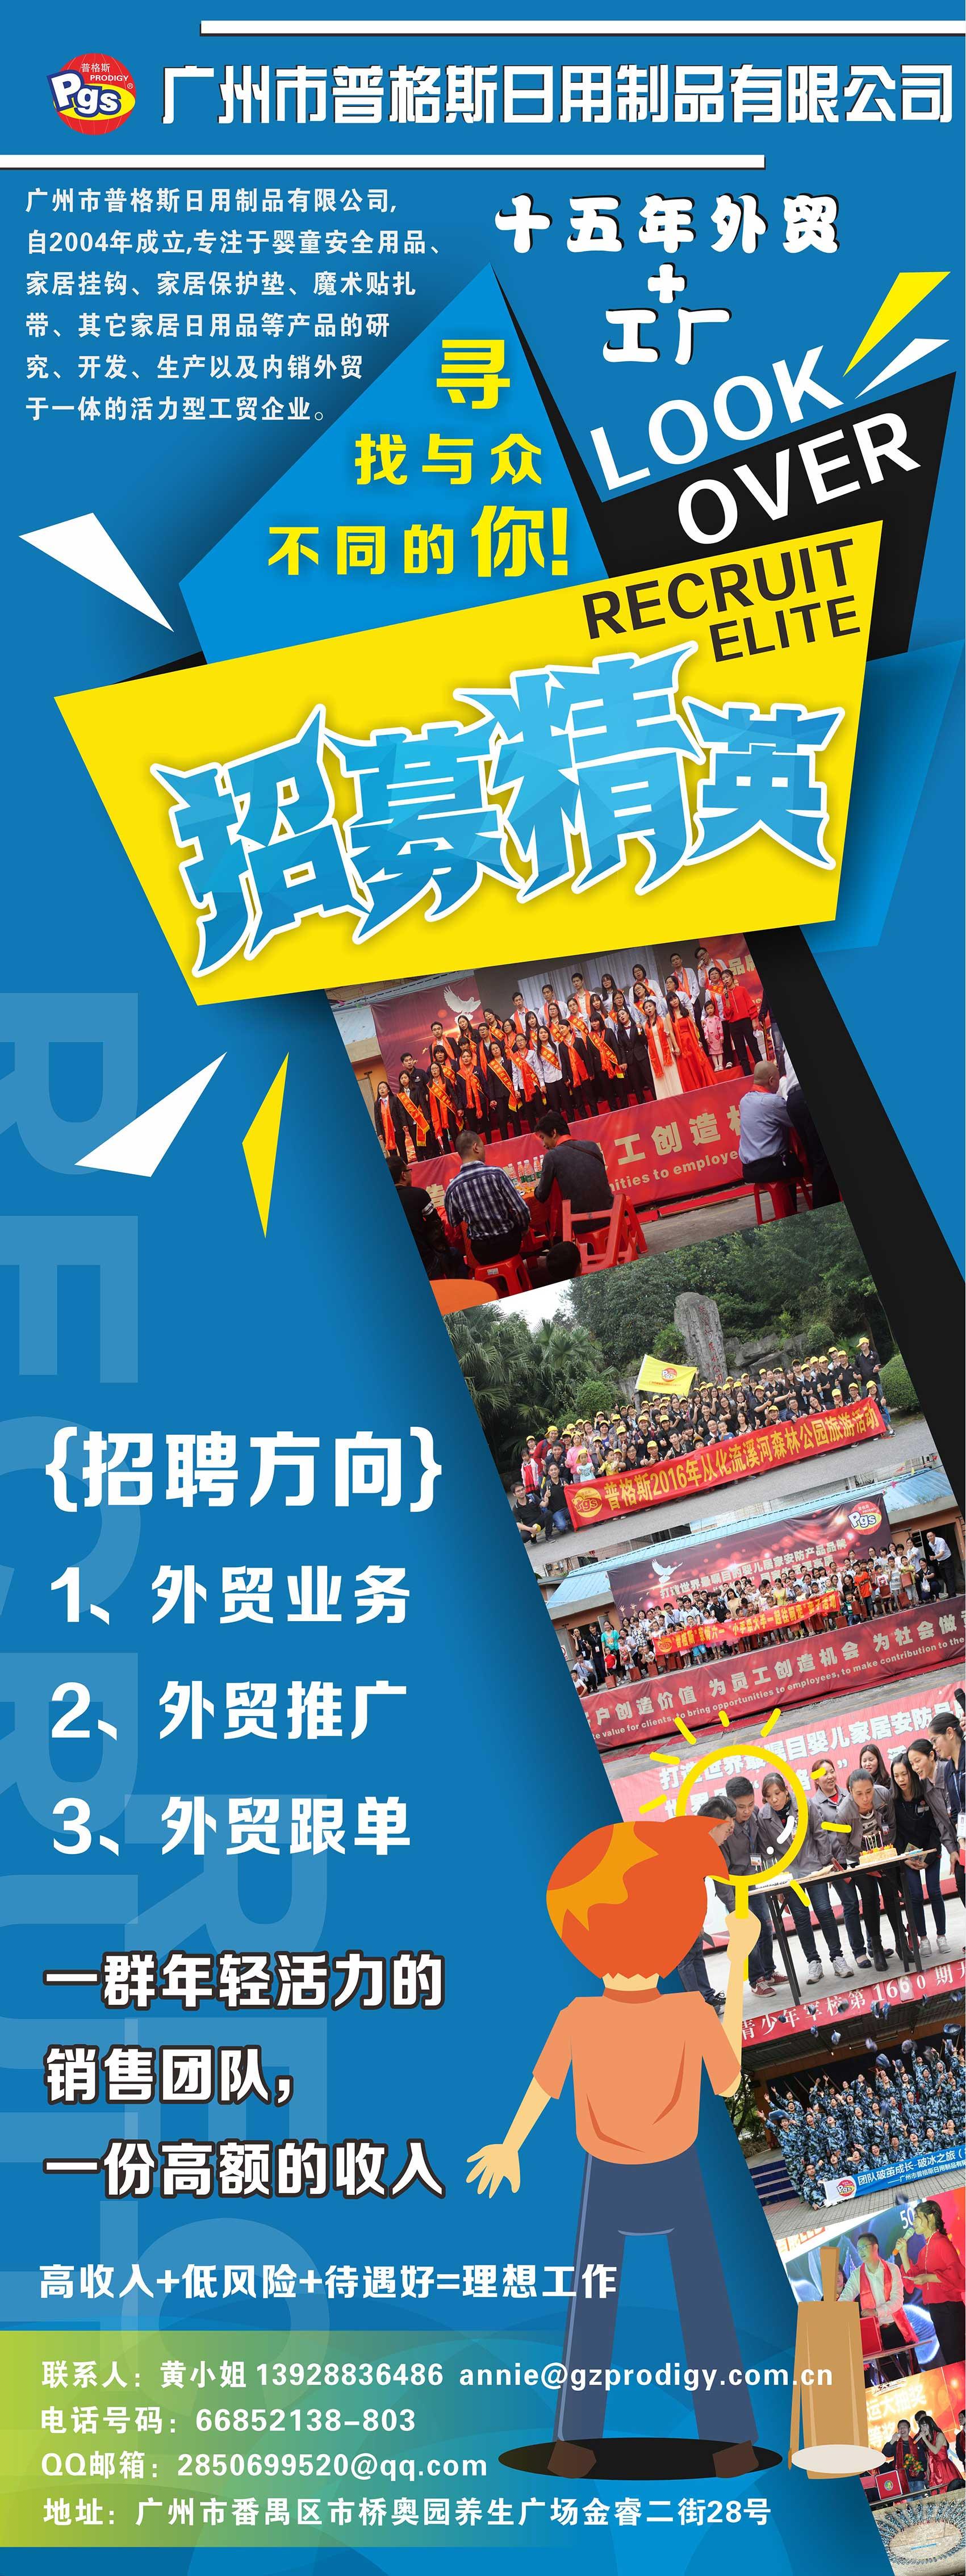 C110广州市普格斯日用制品有限公司宣讲会